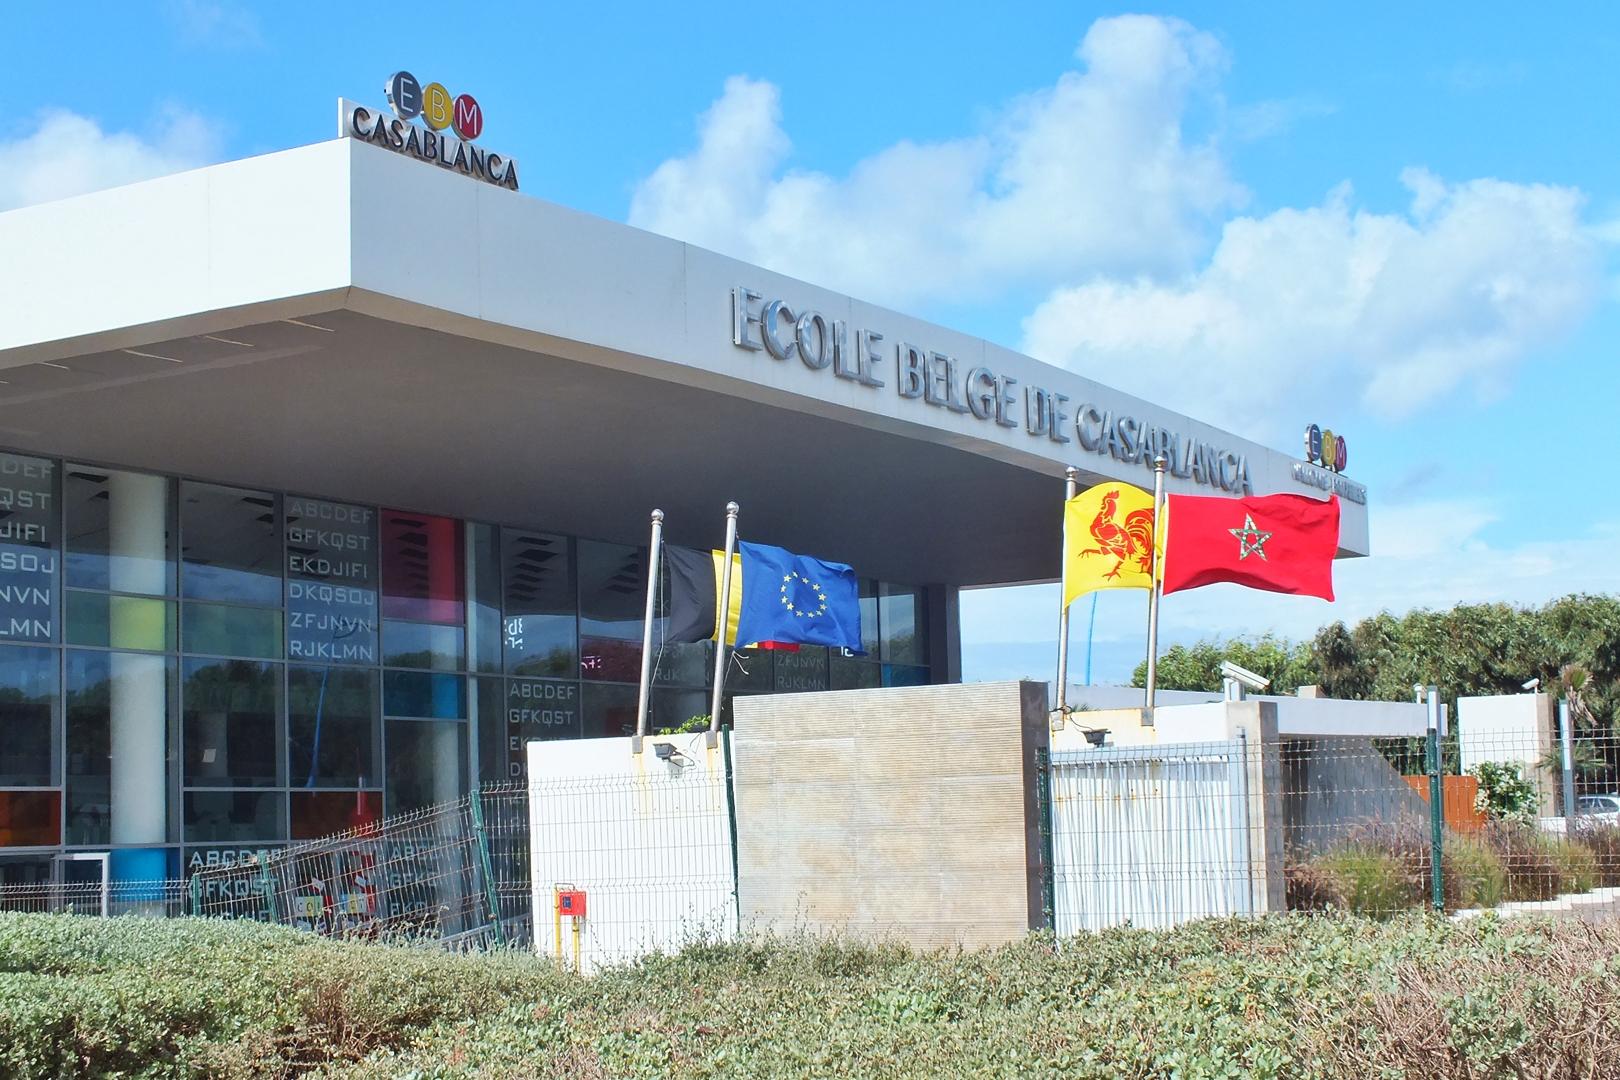 A Belga Iskola